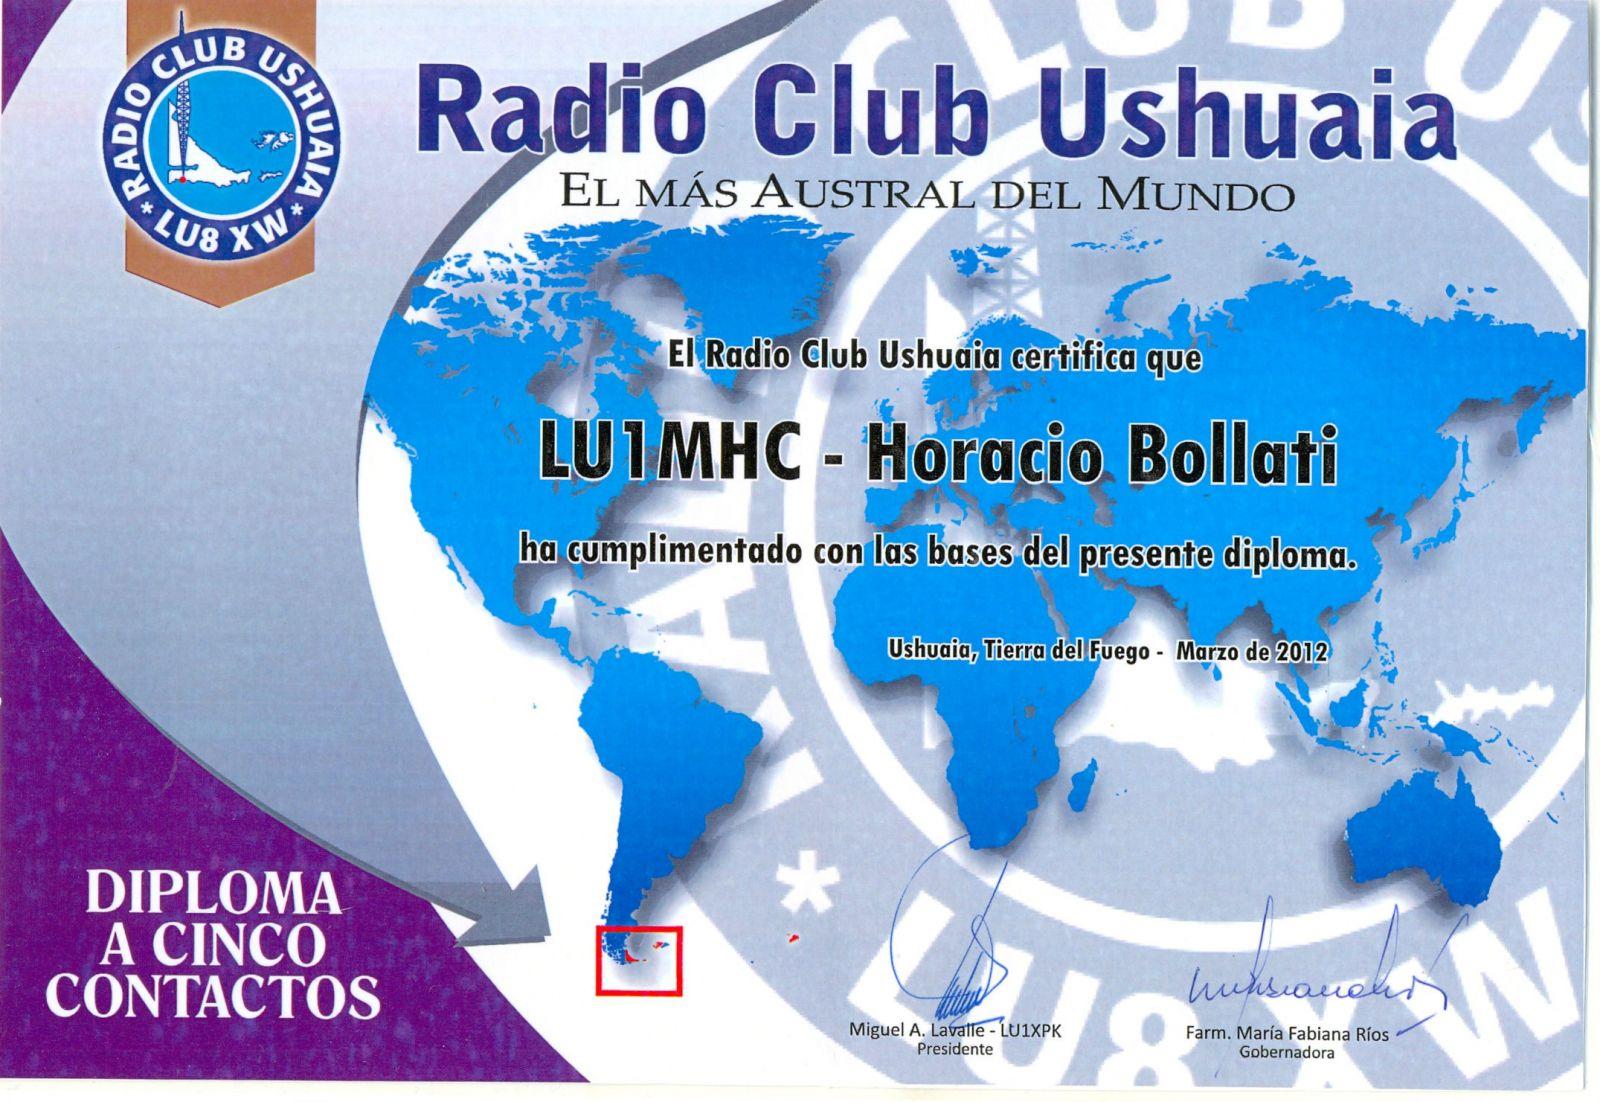 RADIO CLUB USHUAIA DIPLOMA Fueguino